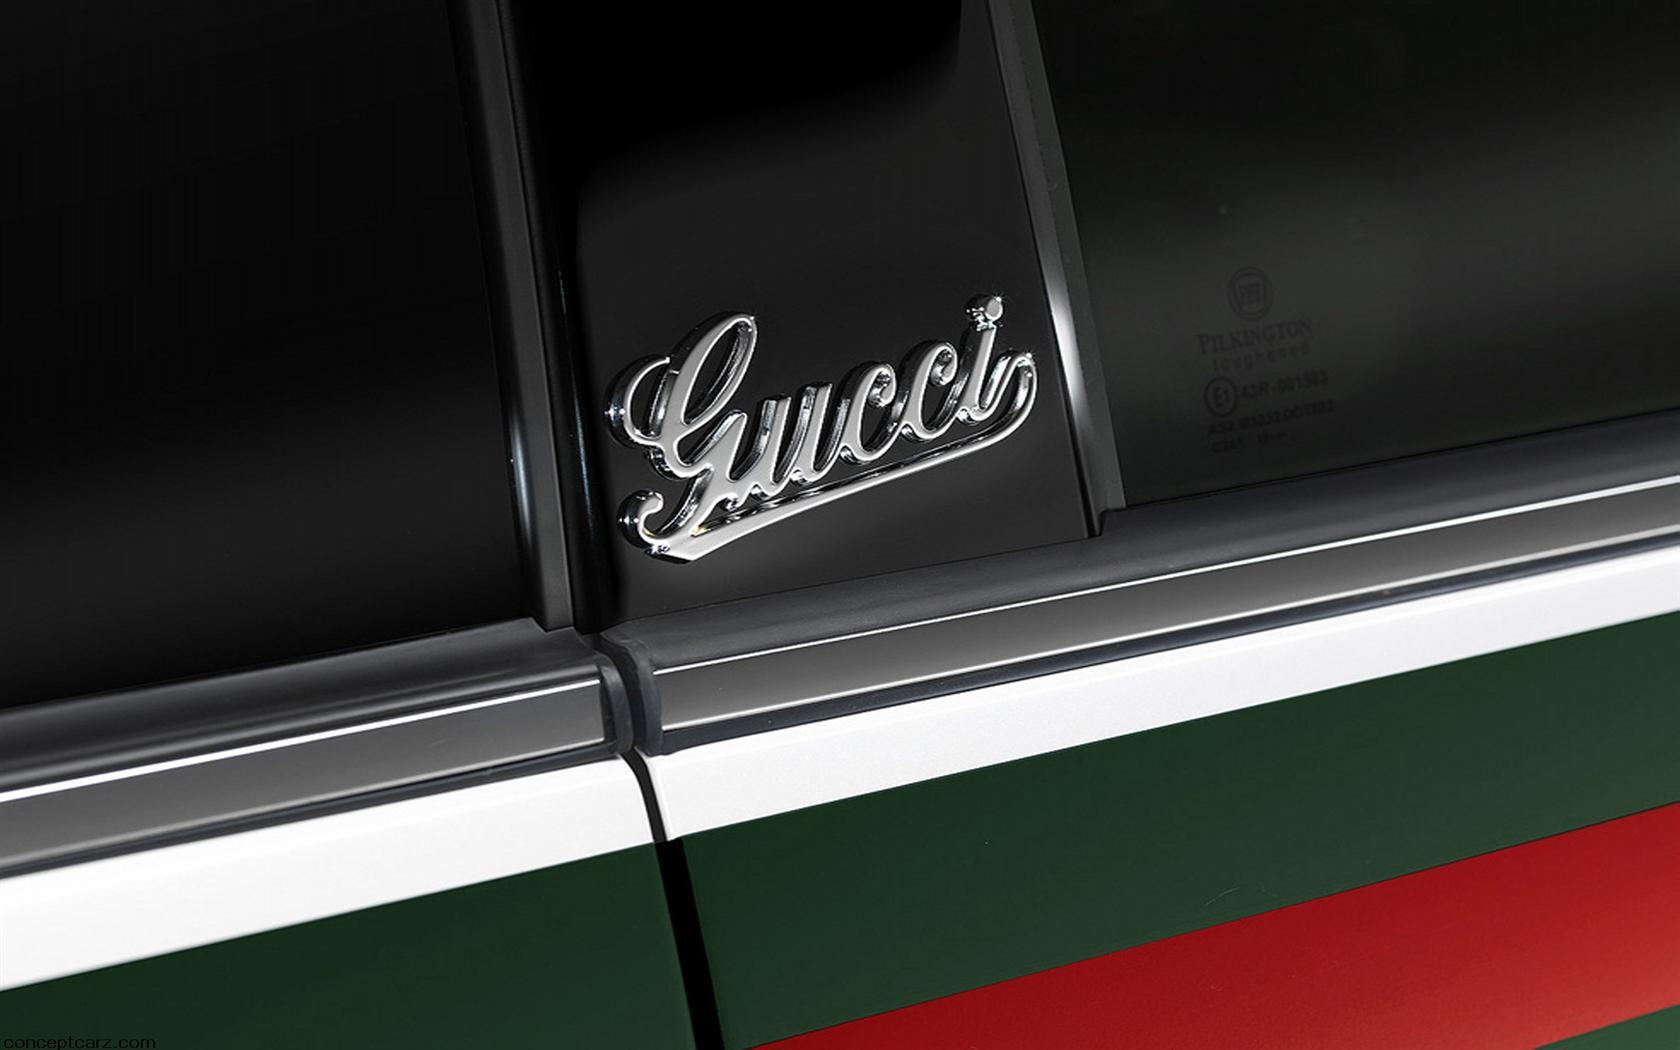 2011 Fiat 500 By Gucci Image Https Www Conceptcarz Com